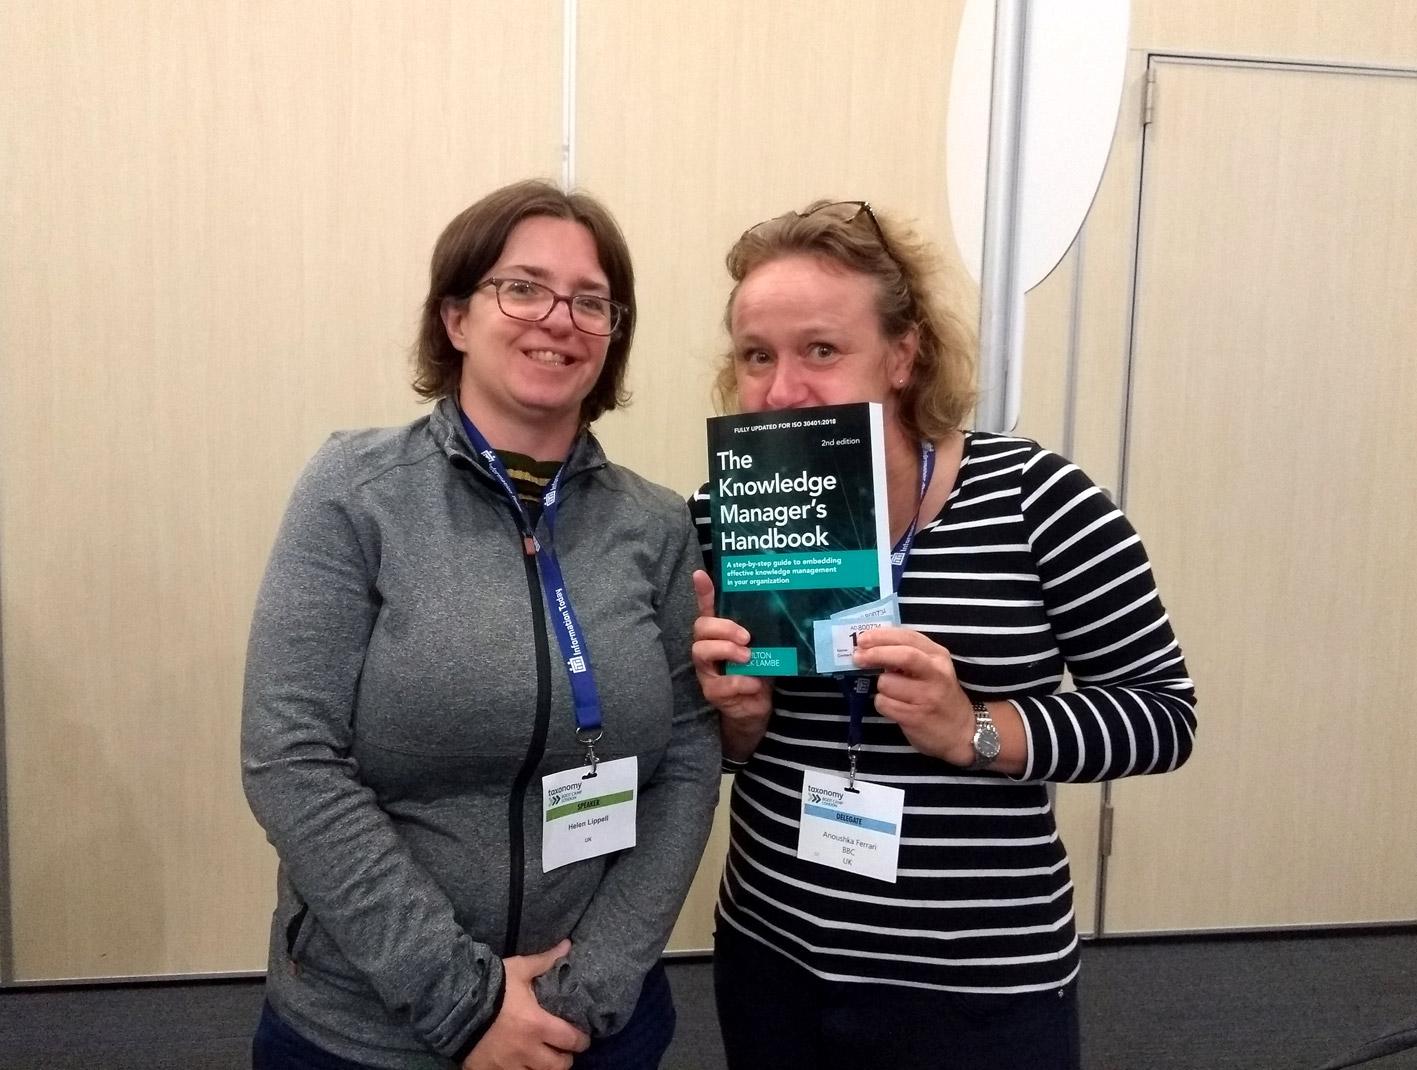 Anoushka Ferrari with Helen Lippell, organiser of the Taxonomy Bootcamp